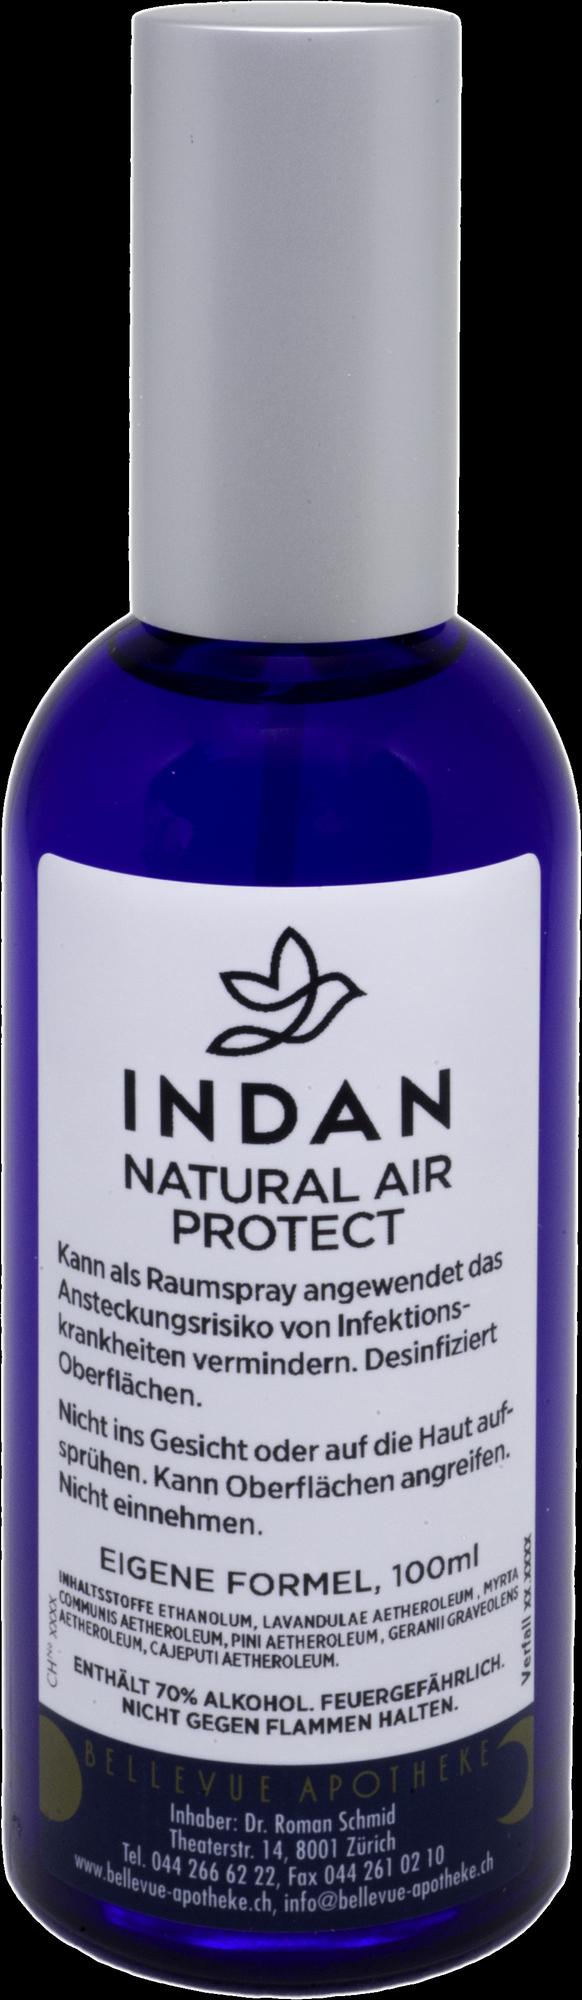 INDAN Natural Air Protect · Bellevue Apotheke Zürich